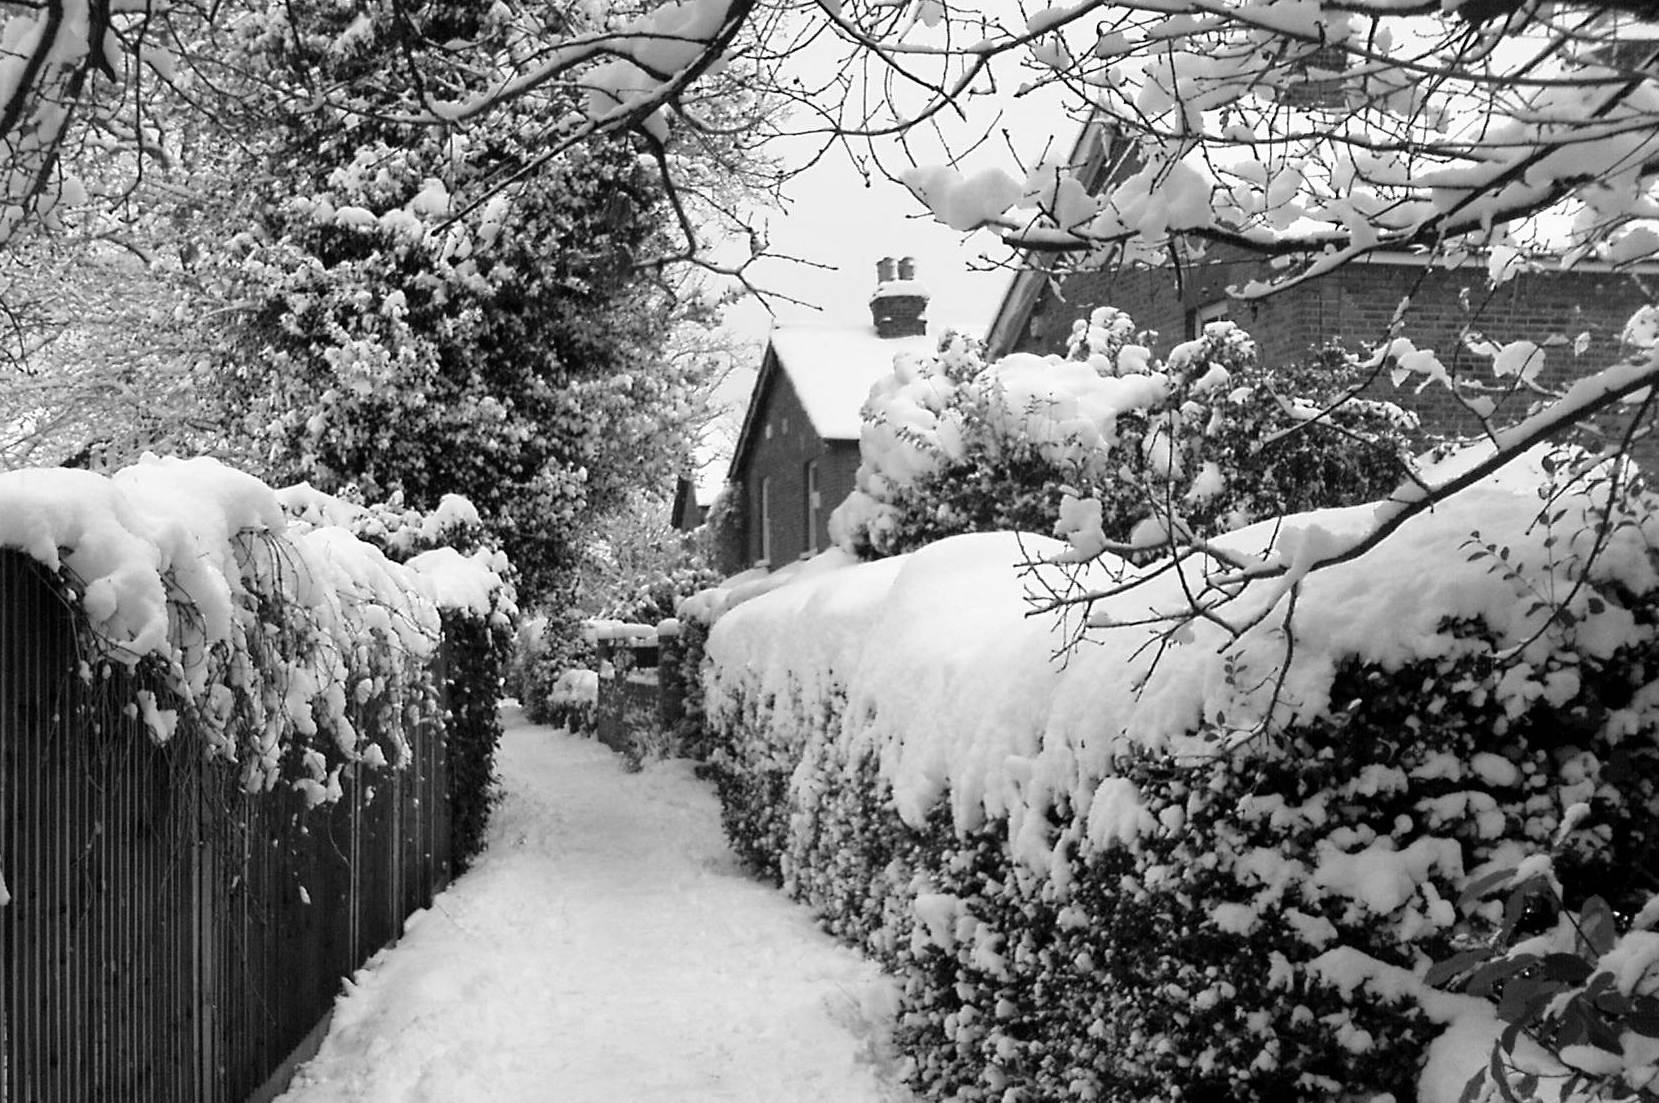 Church Walk in the snow